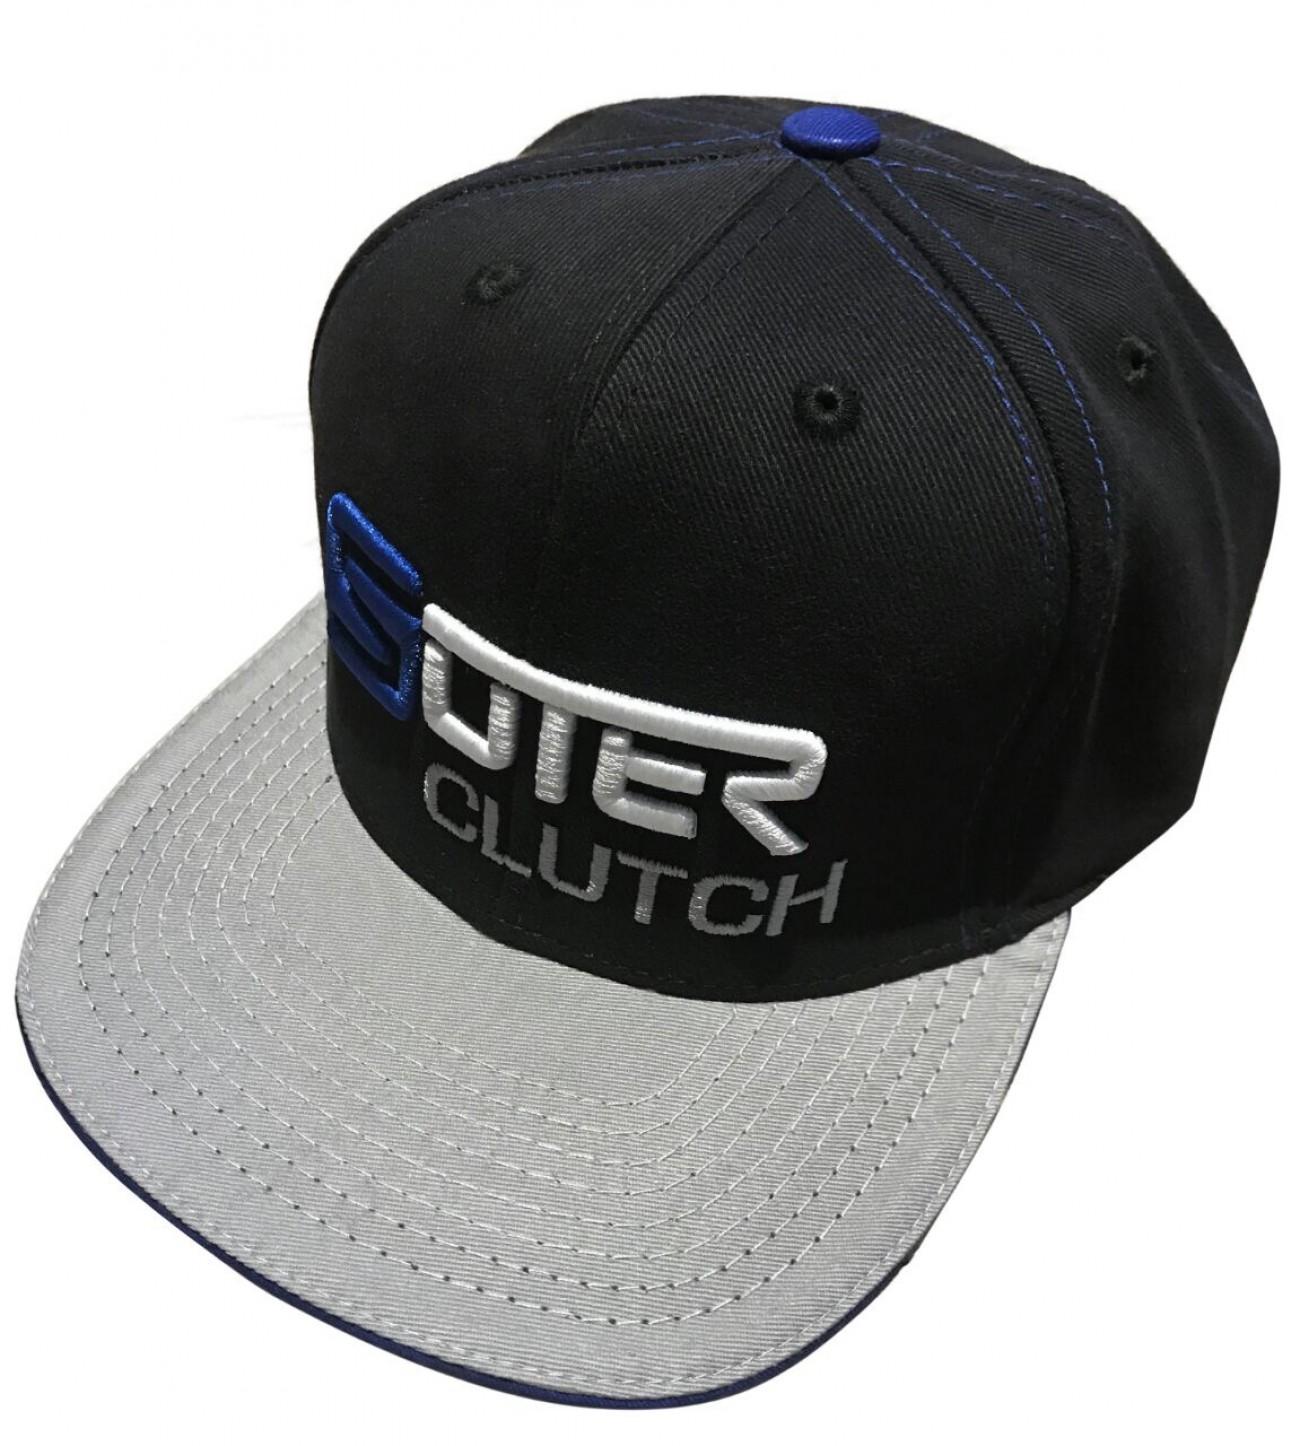 SUTER Clutch キャップ